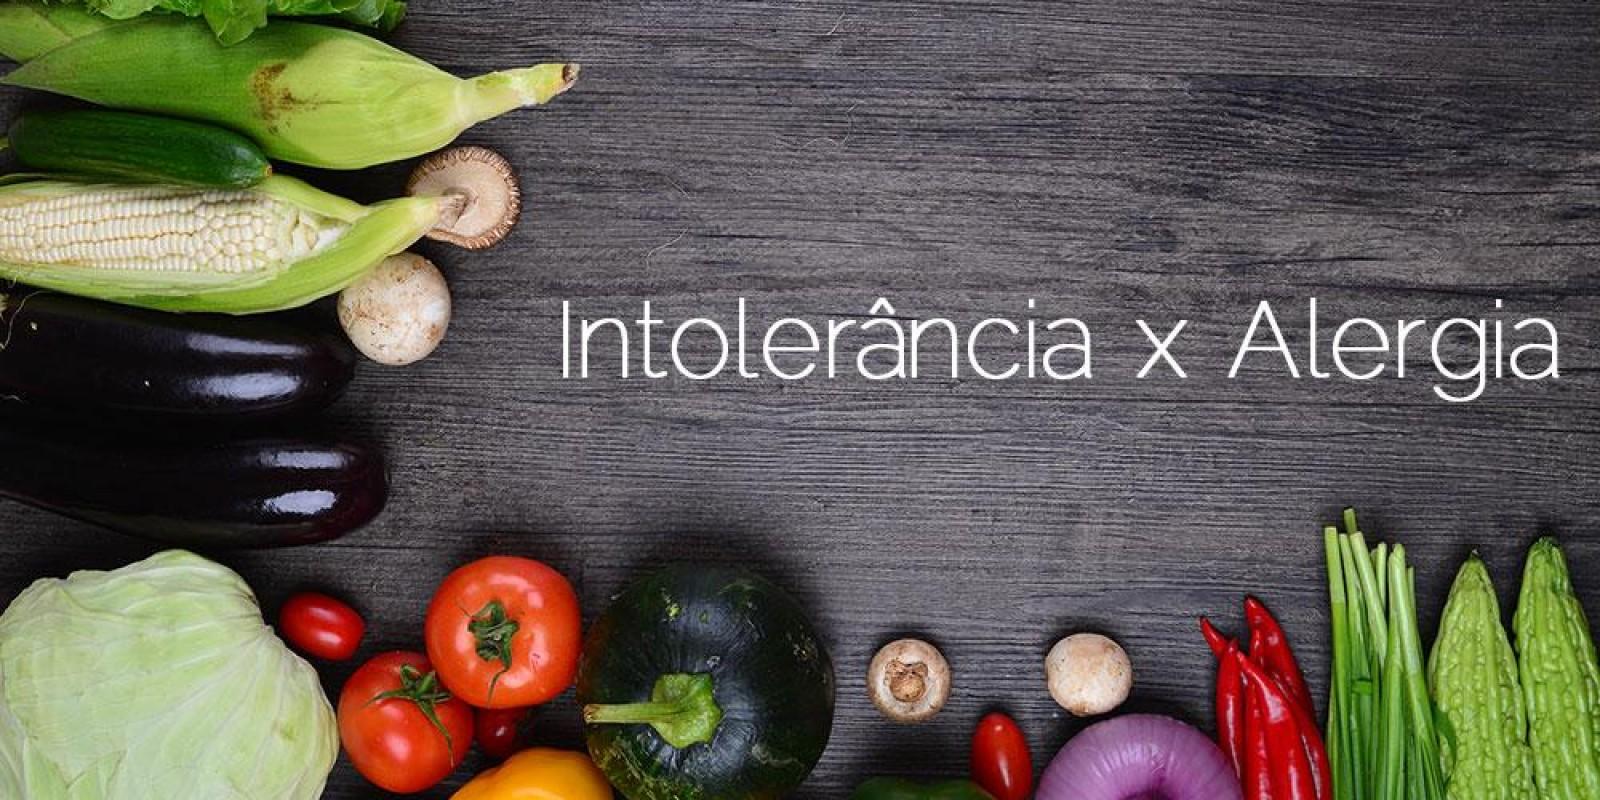 Alergia X Intolerância Alimentar: Entenda a diferença!